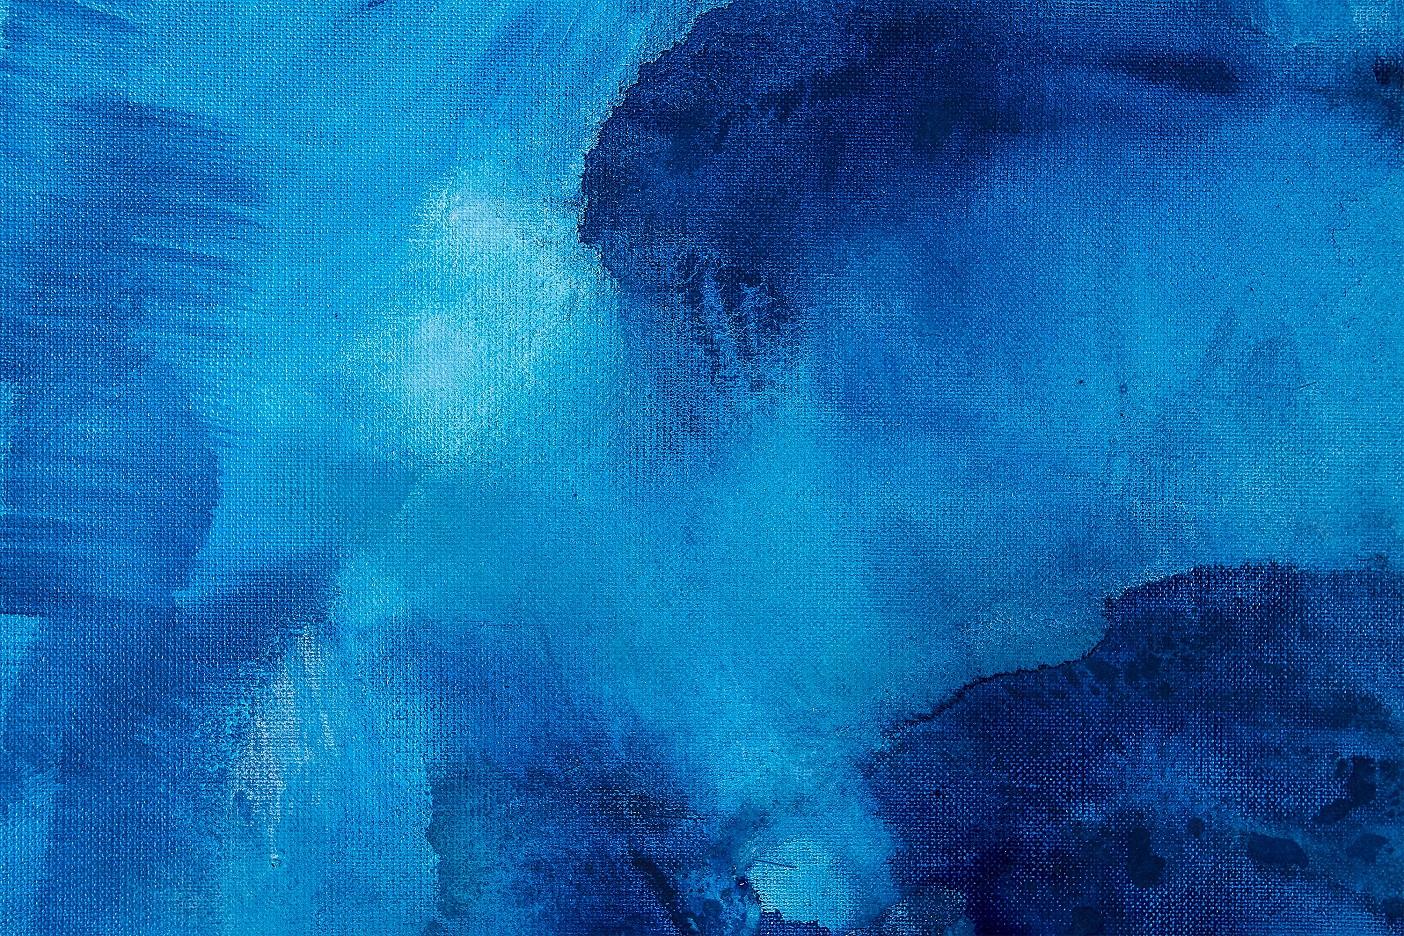 Blue Dreaming I Blaues Träumen